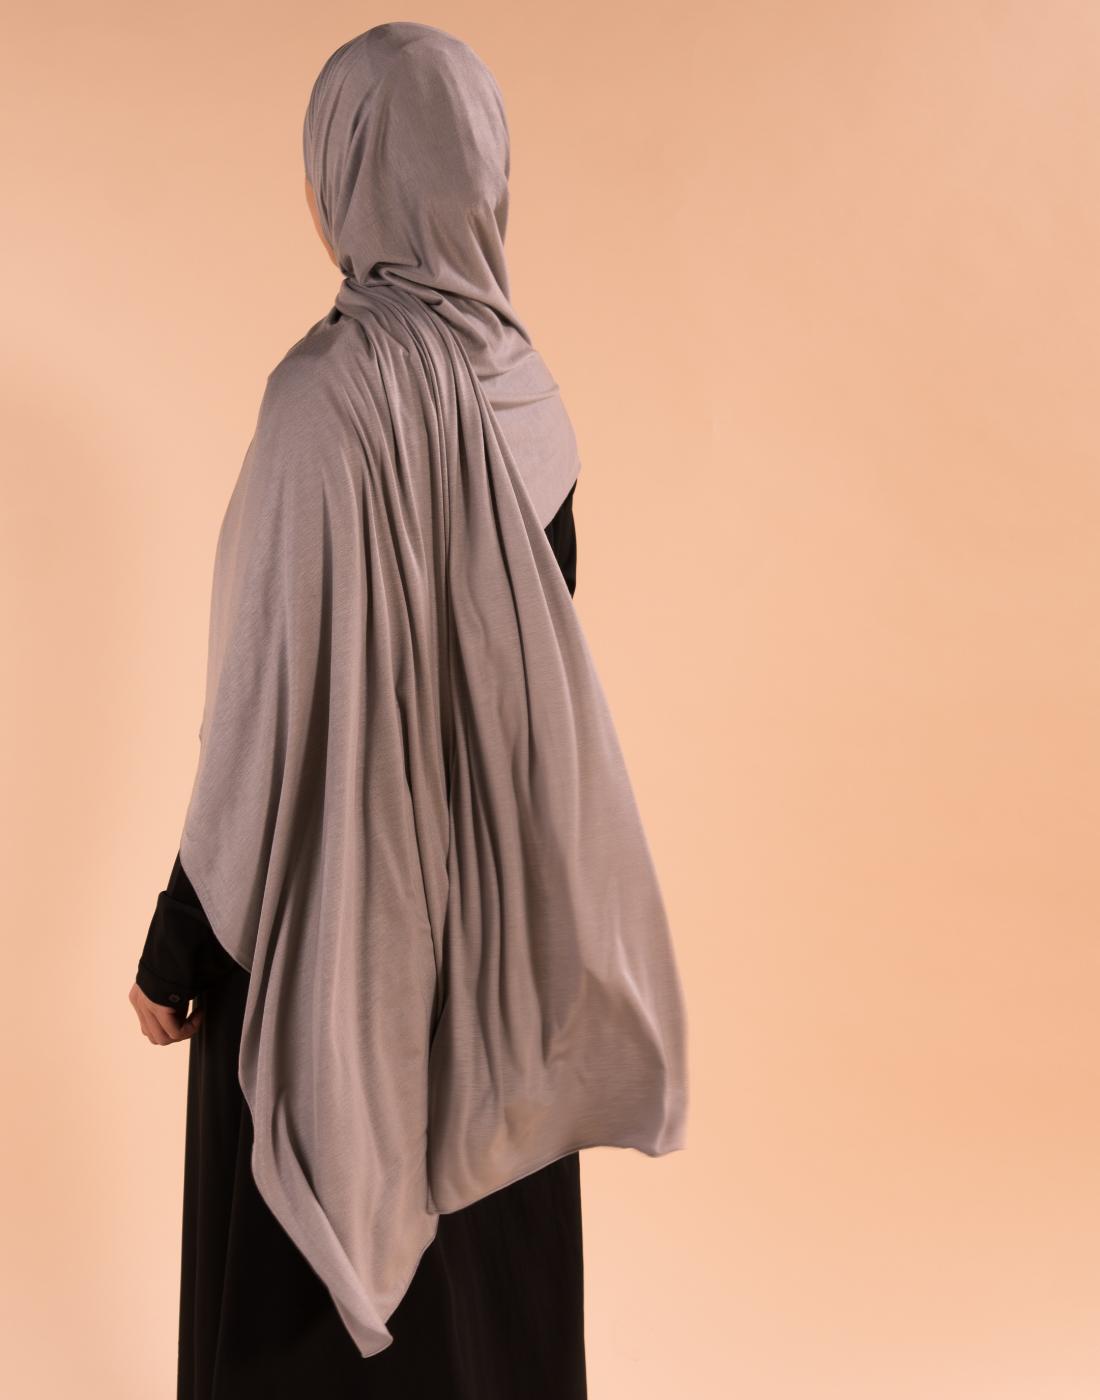 hijab_jersey_viscose_xxl_gris